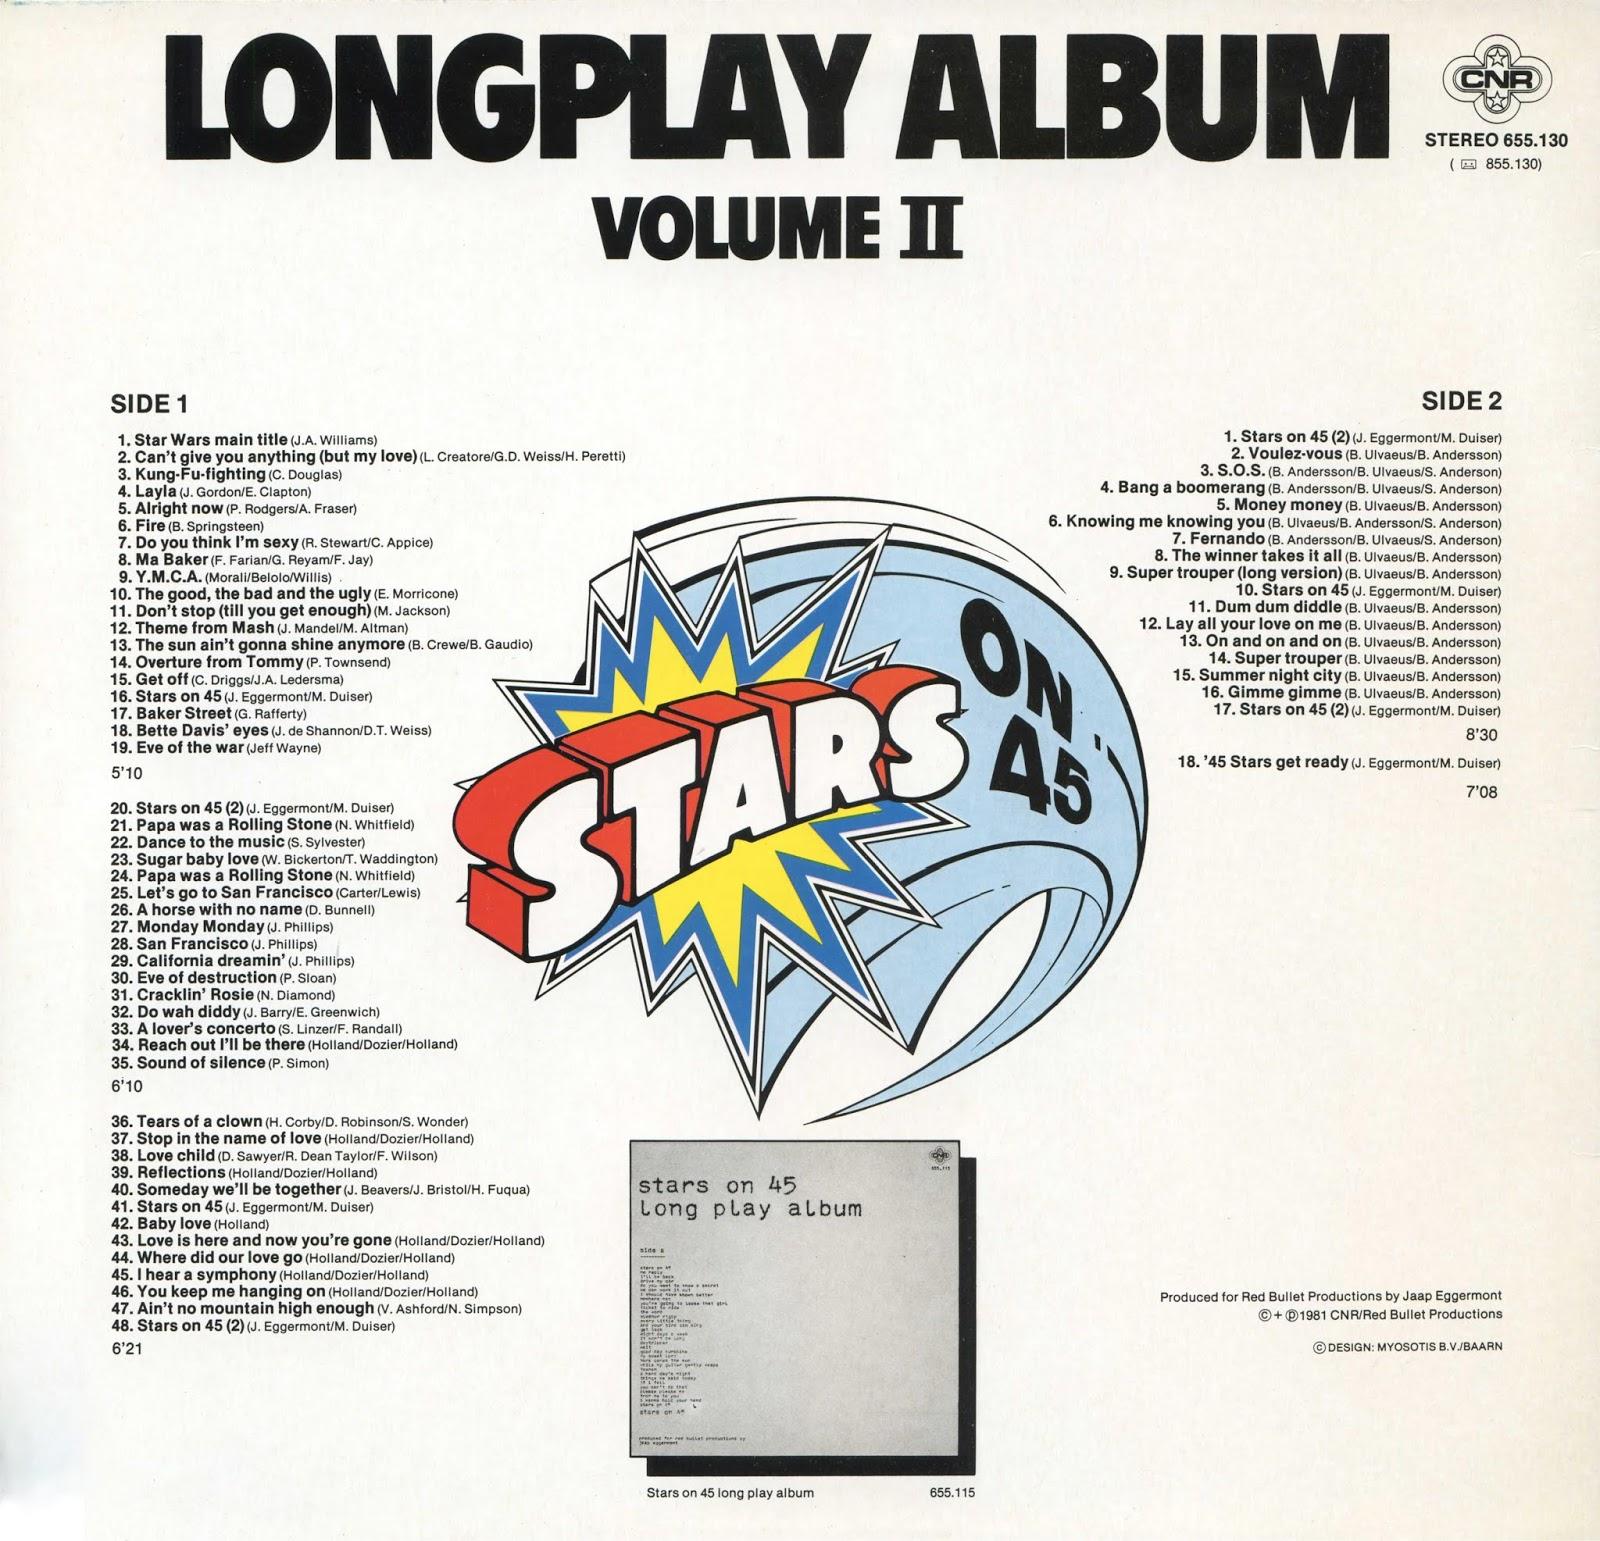 Music Rewind Stars On 45 Longplay Album Volume Ii